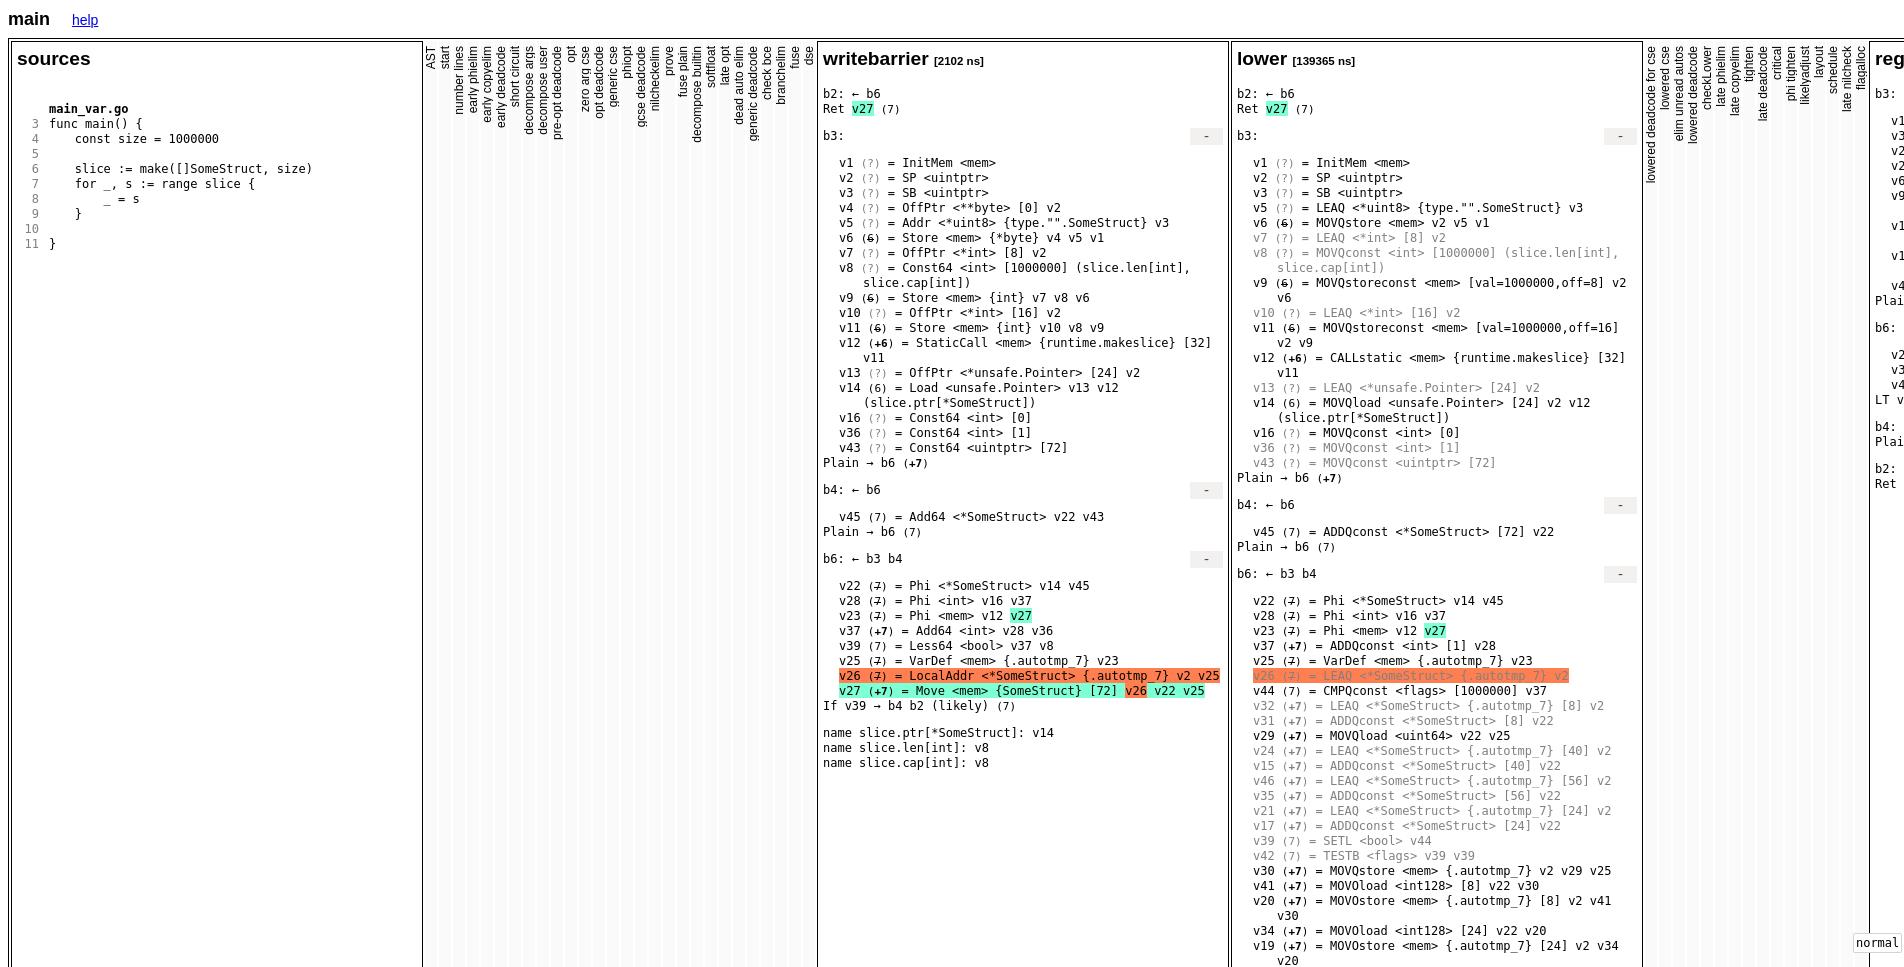 Generated SSA HTML